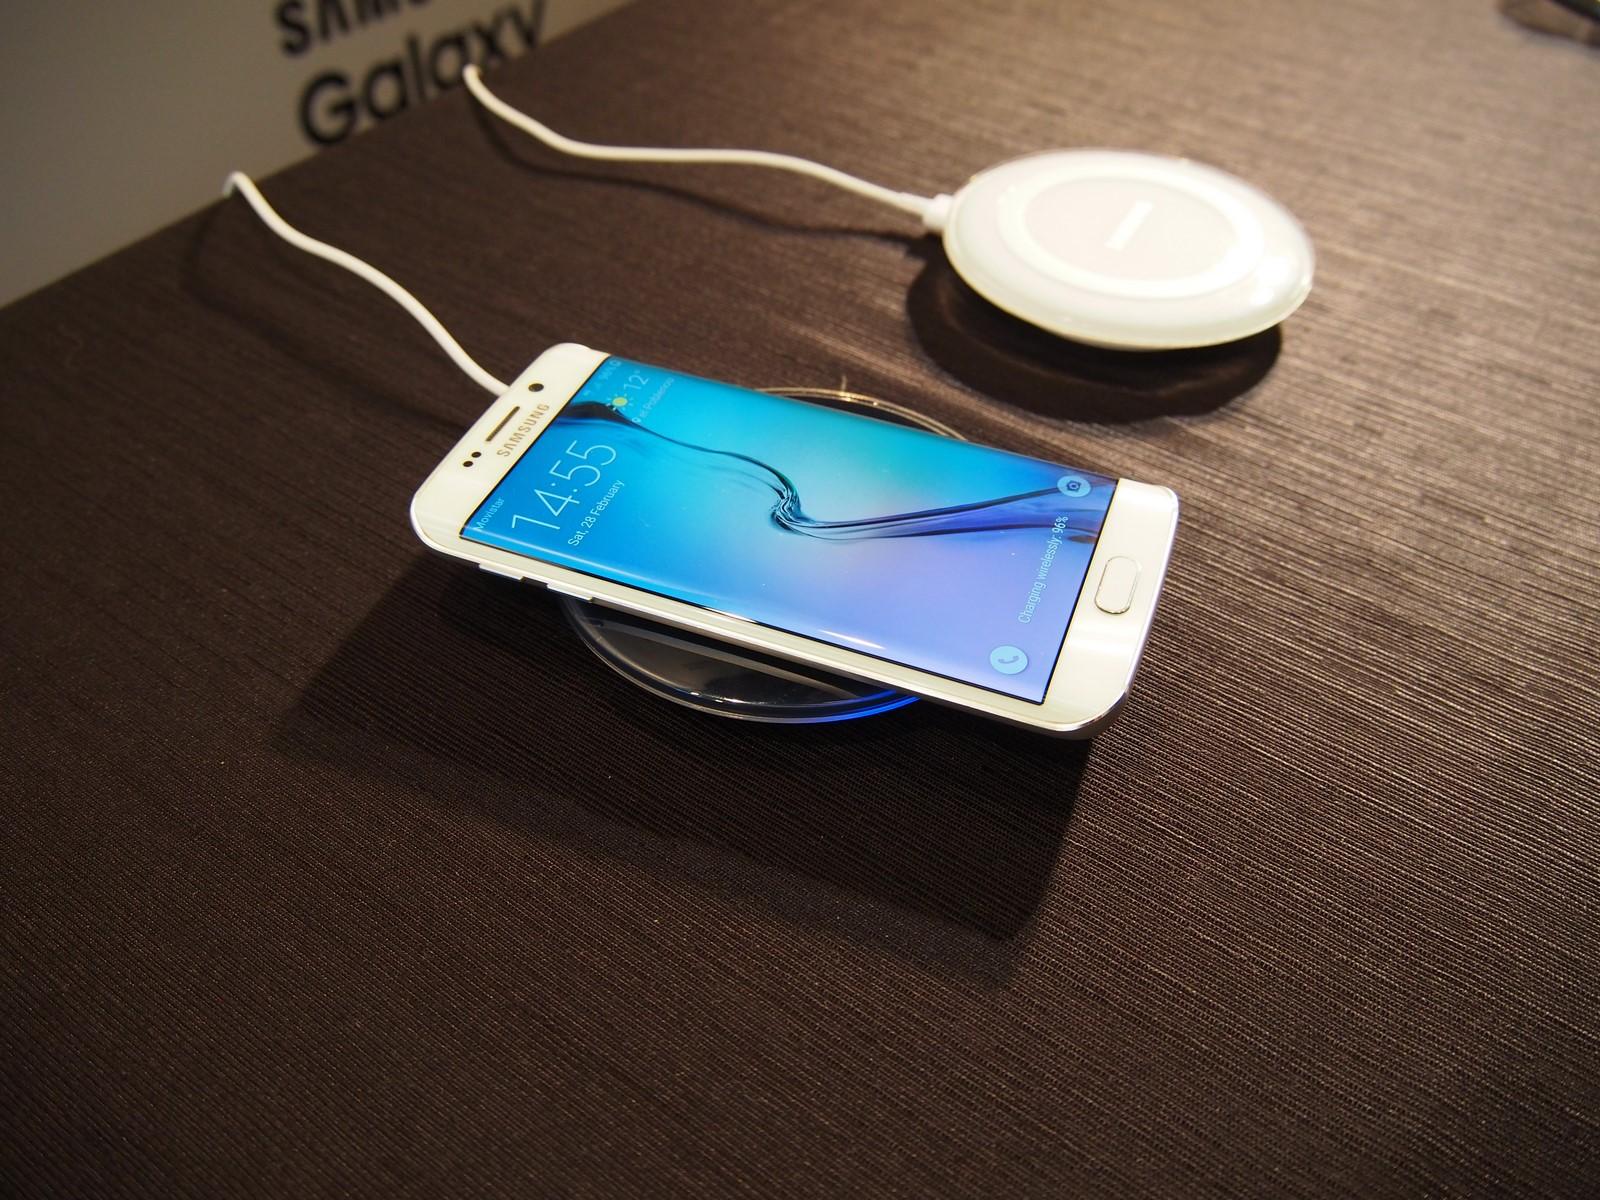 Premiera Samsunga Galaxy S6 oraz Galaxy S6 Edge – Spider's Web TV